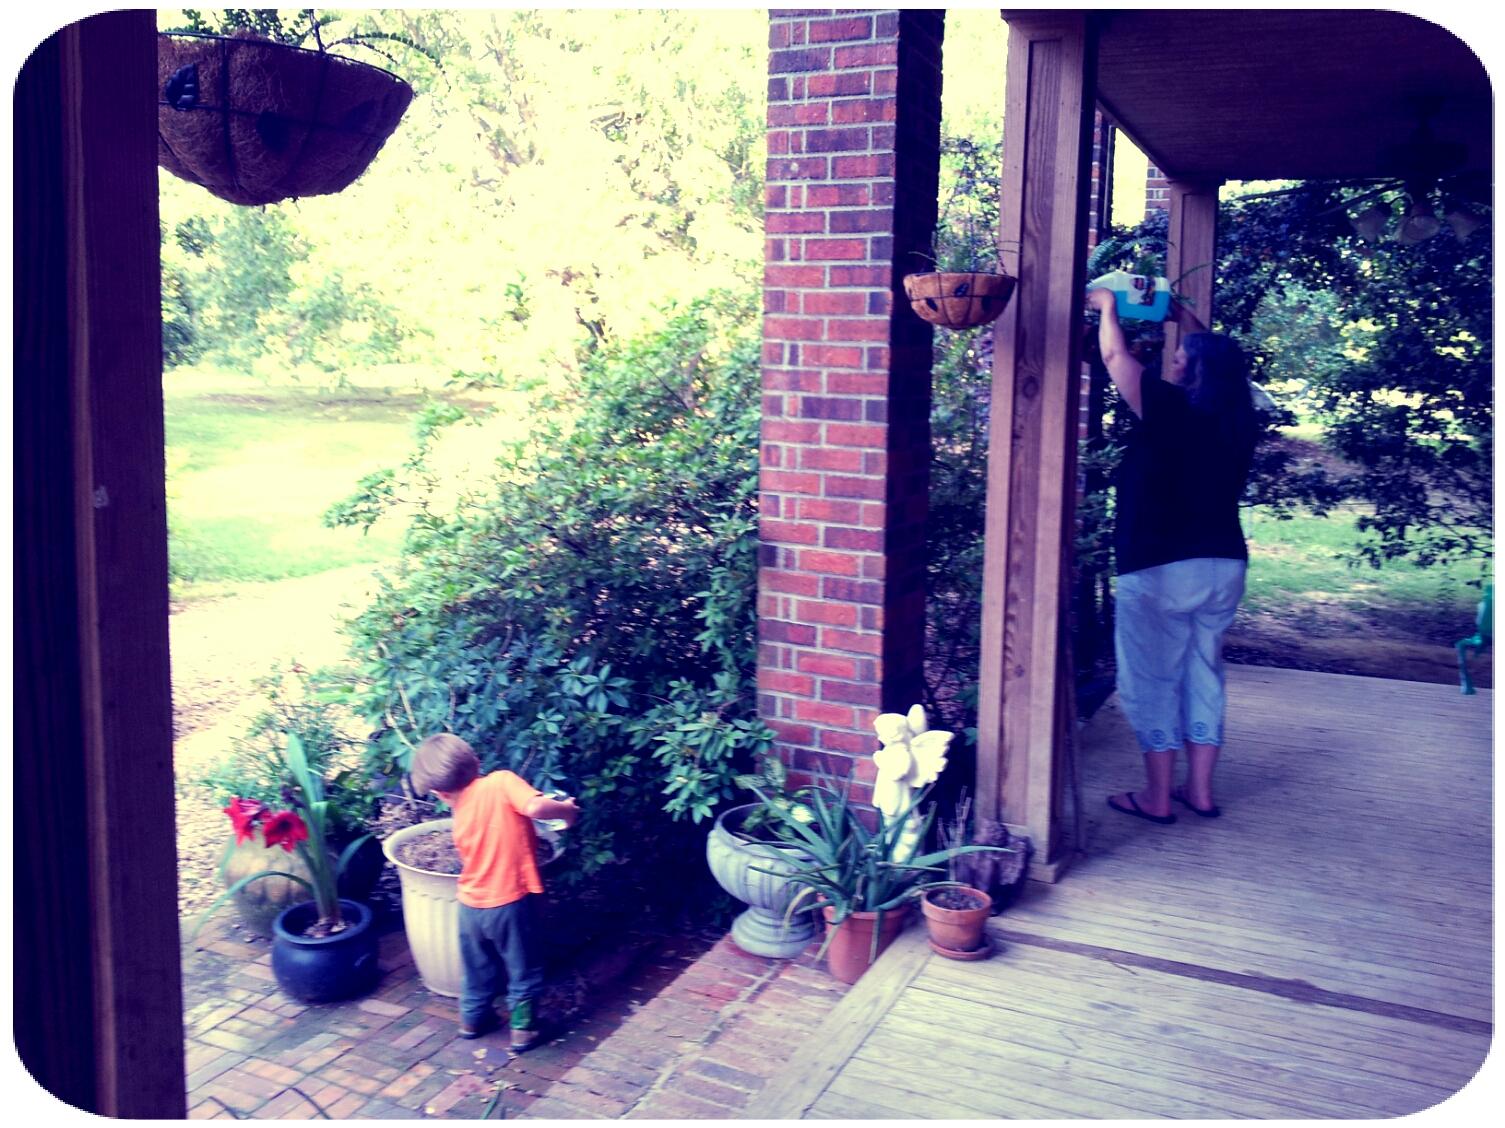 2012-04-27 18.20.07_Josh_Round.jpg